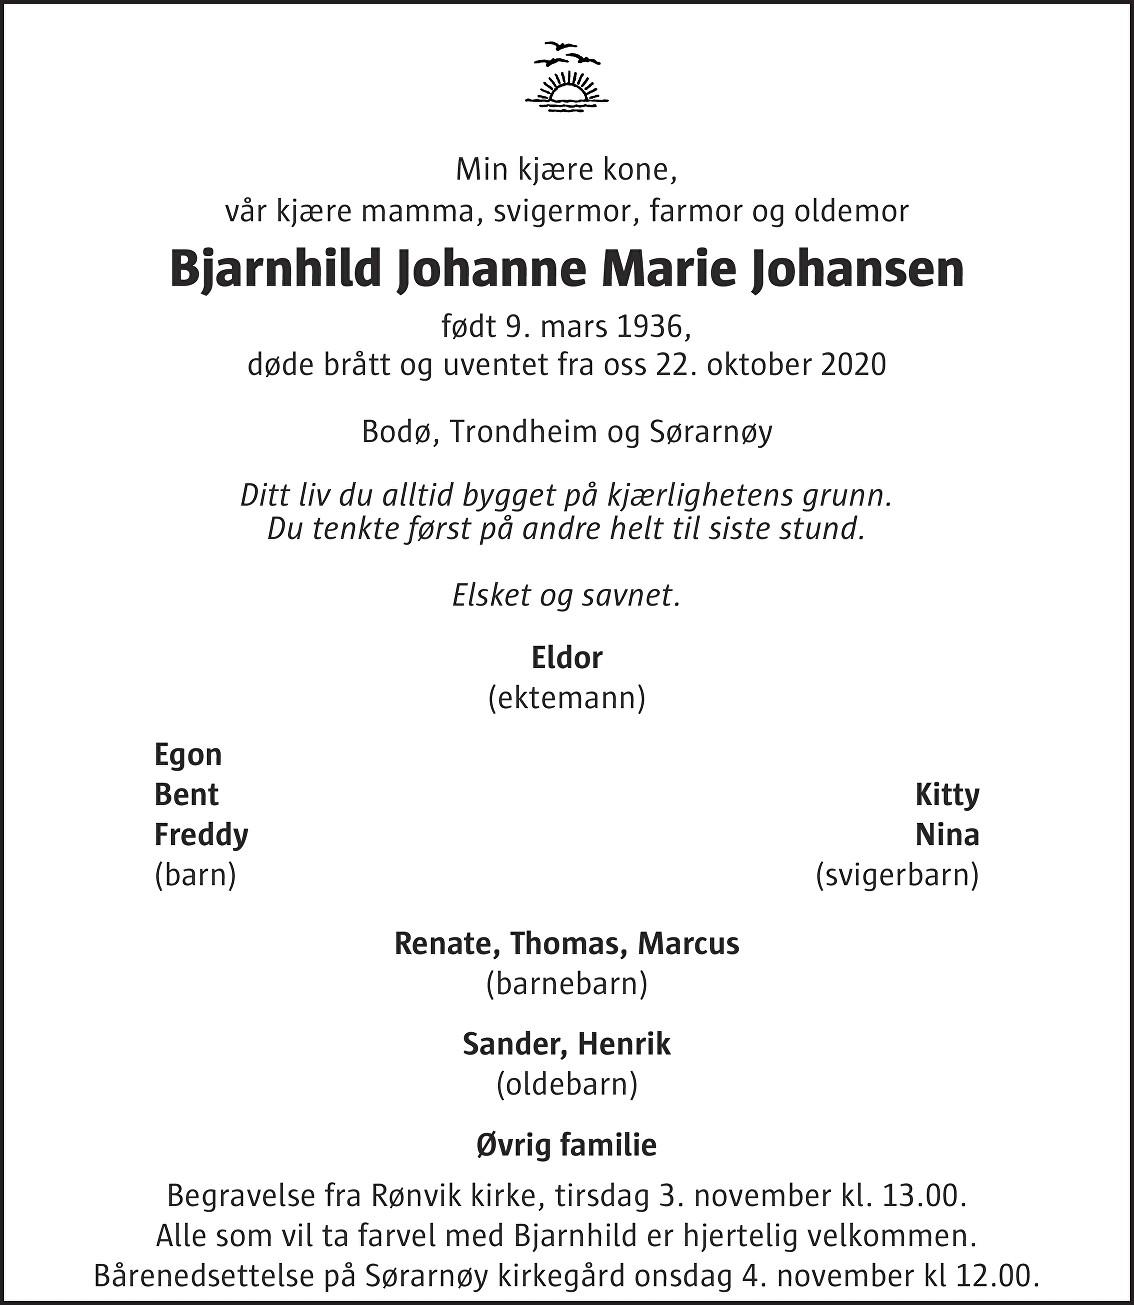 Bjarnhild Johanne Marie Johansen Dødsannonse